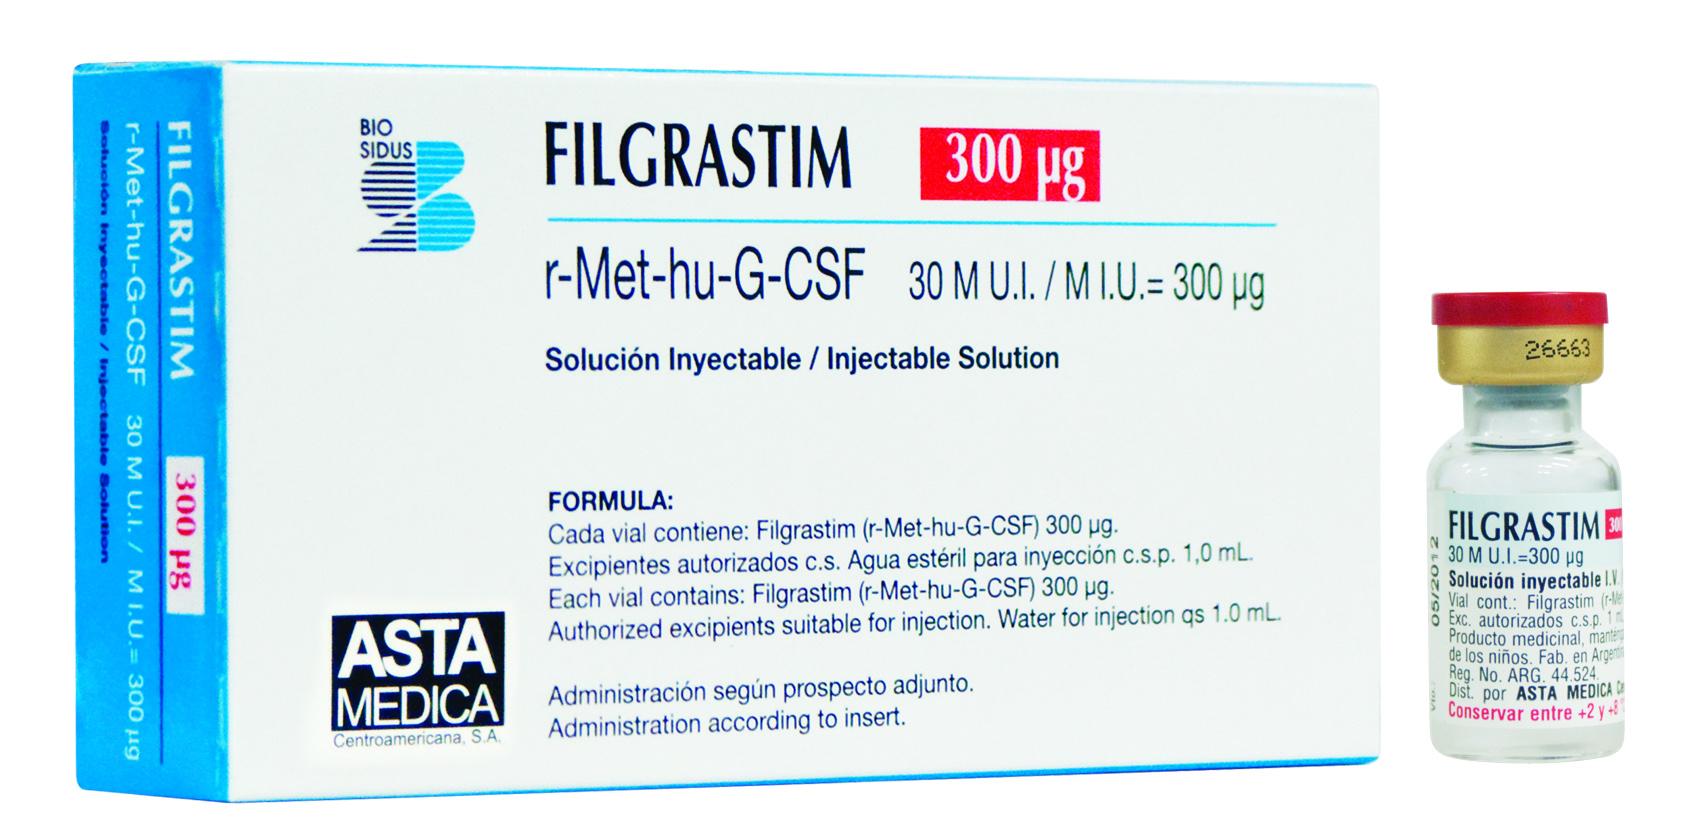 Филграстим (Filgrastim)